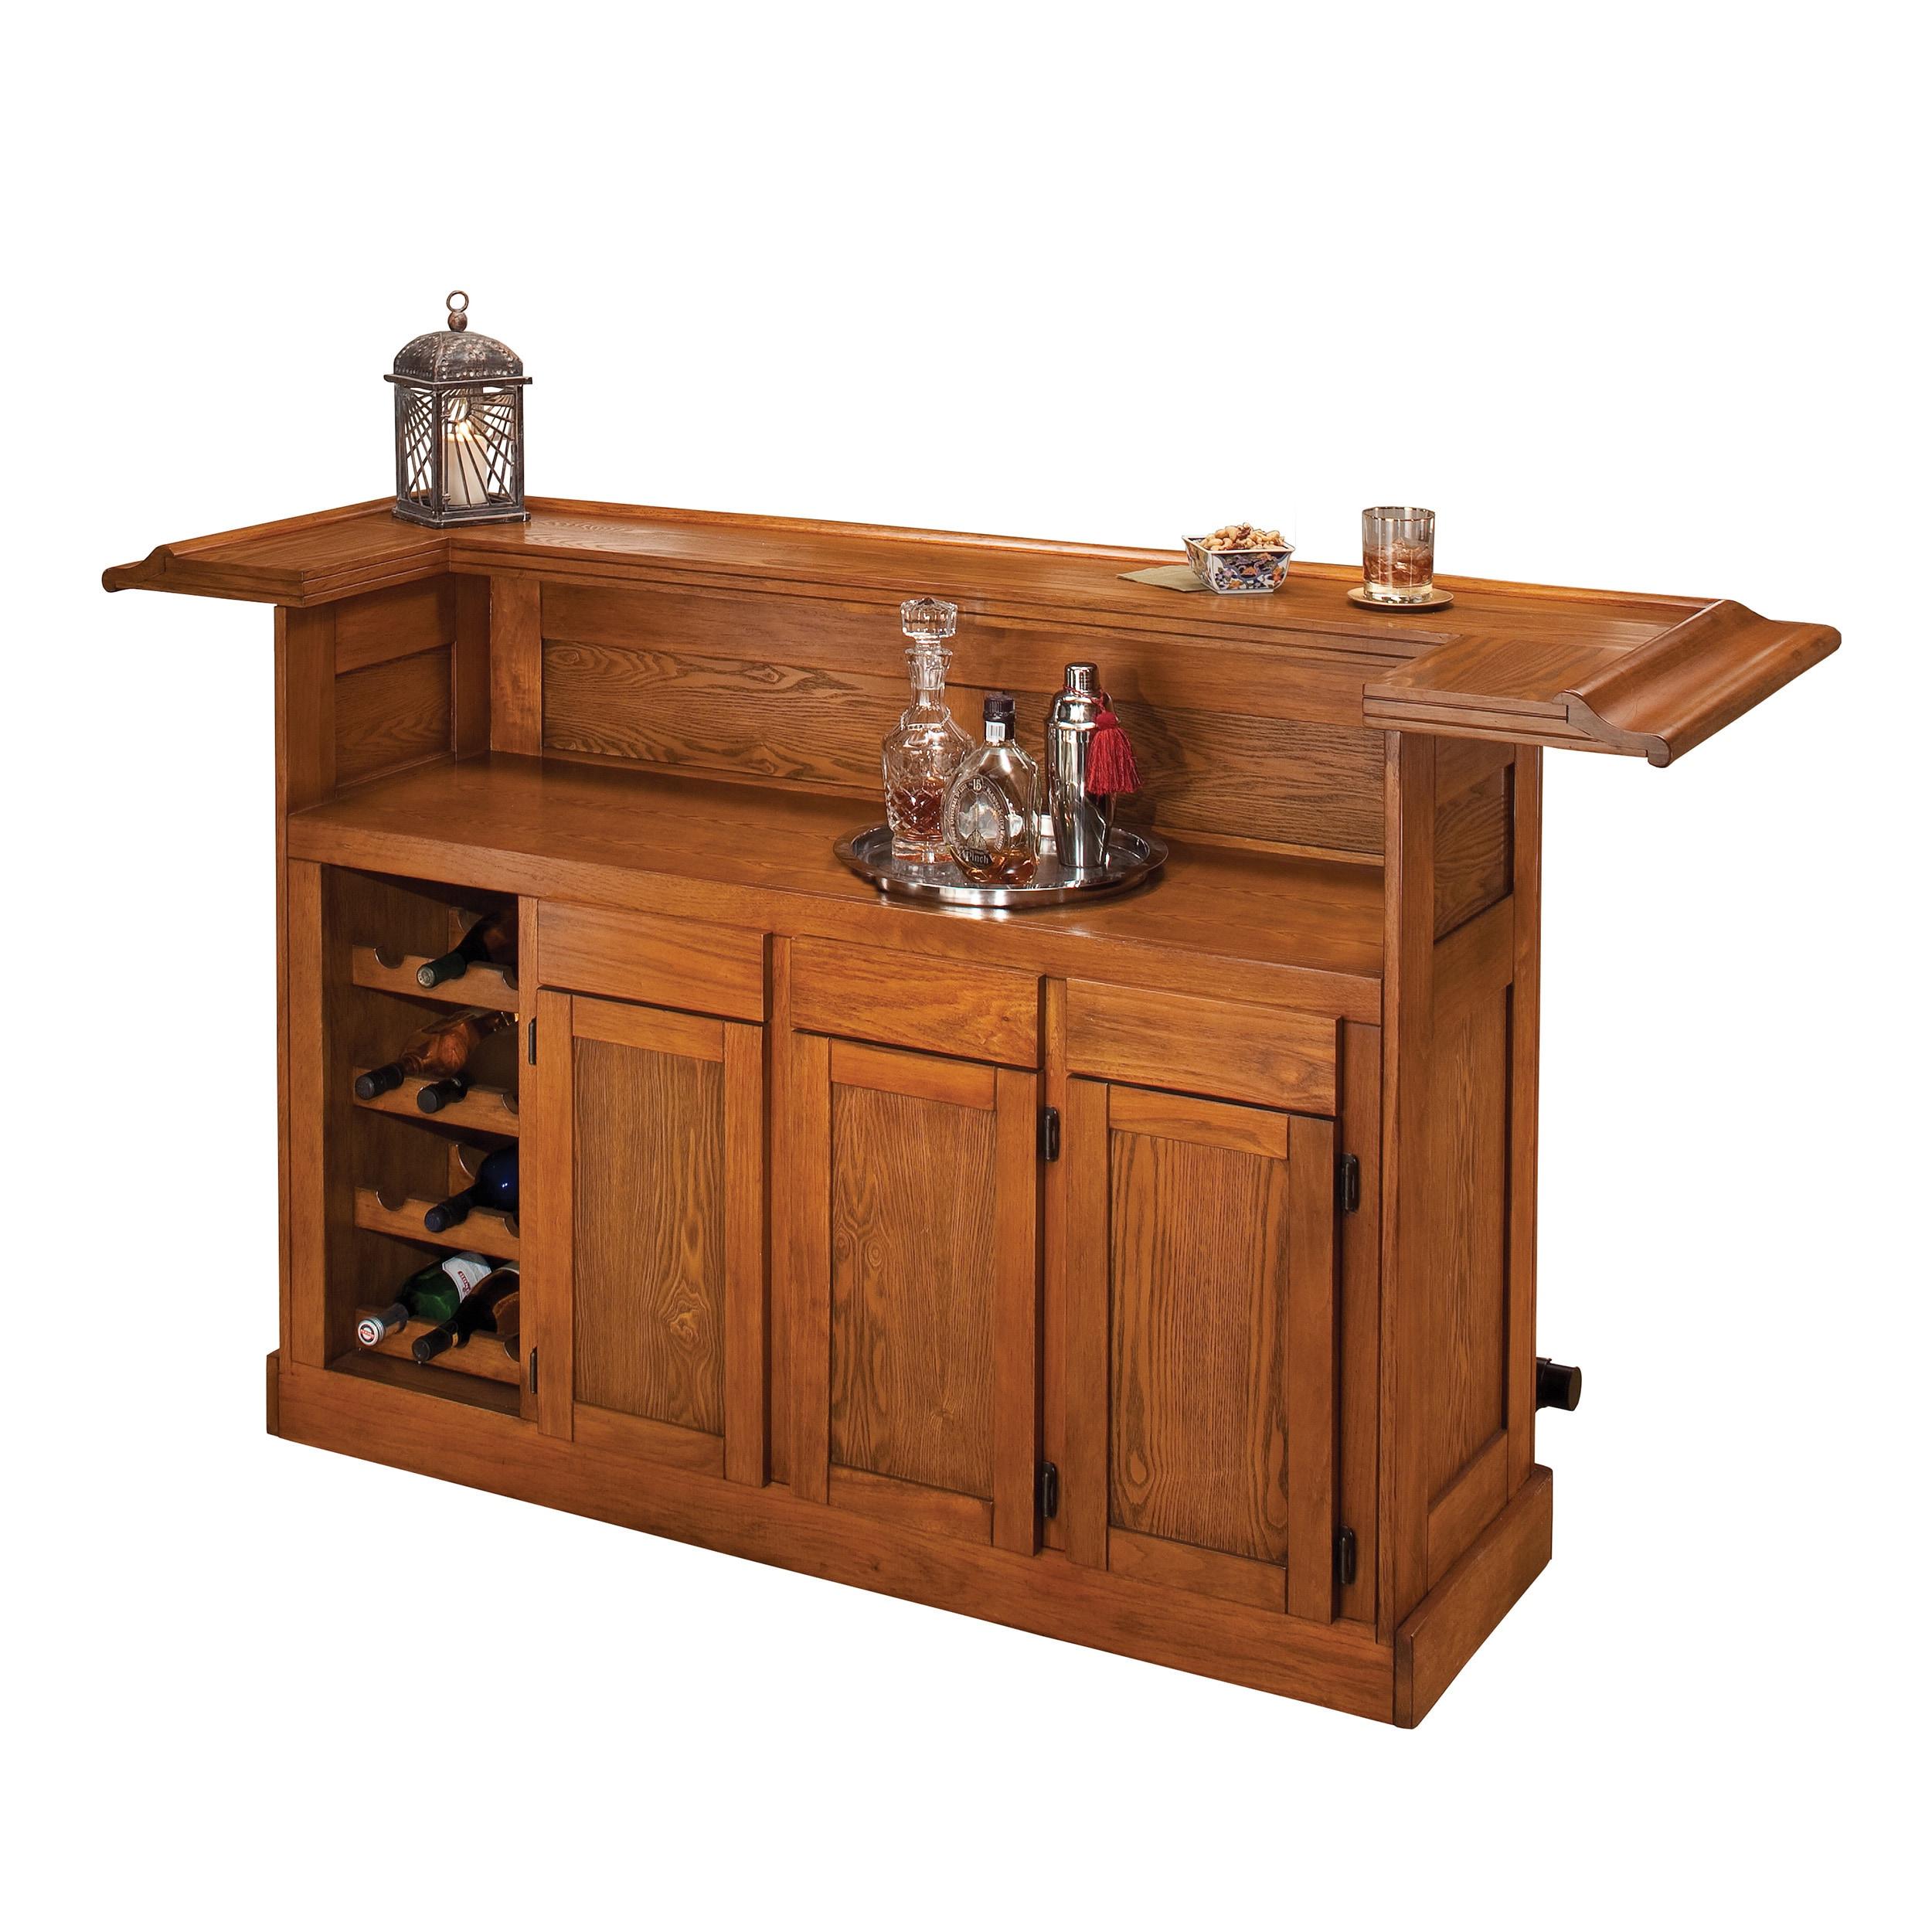 Hillsdale Classic Large Oak Home Bar (Oak), Brown